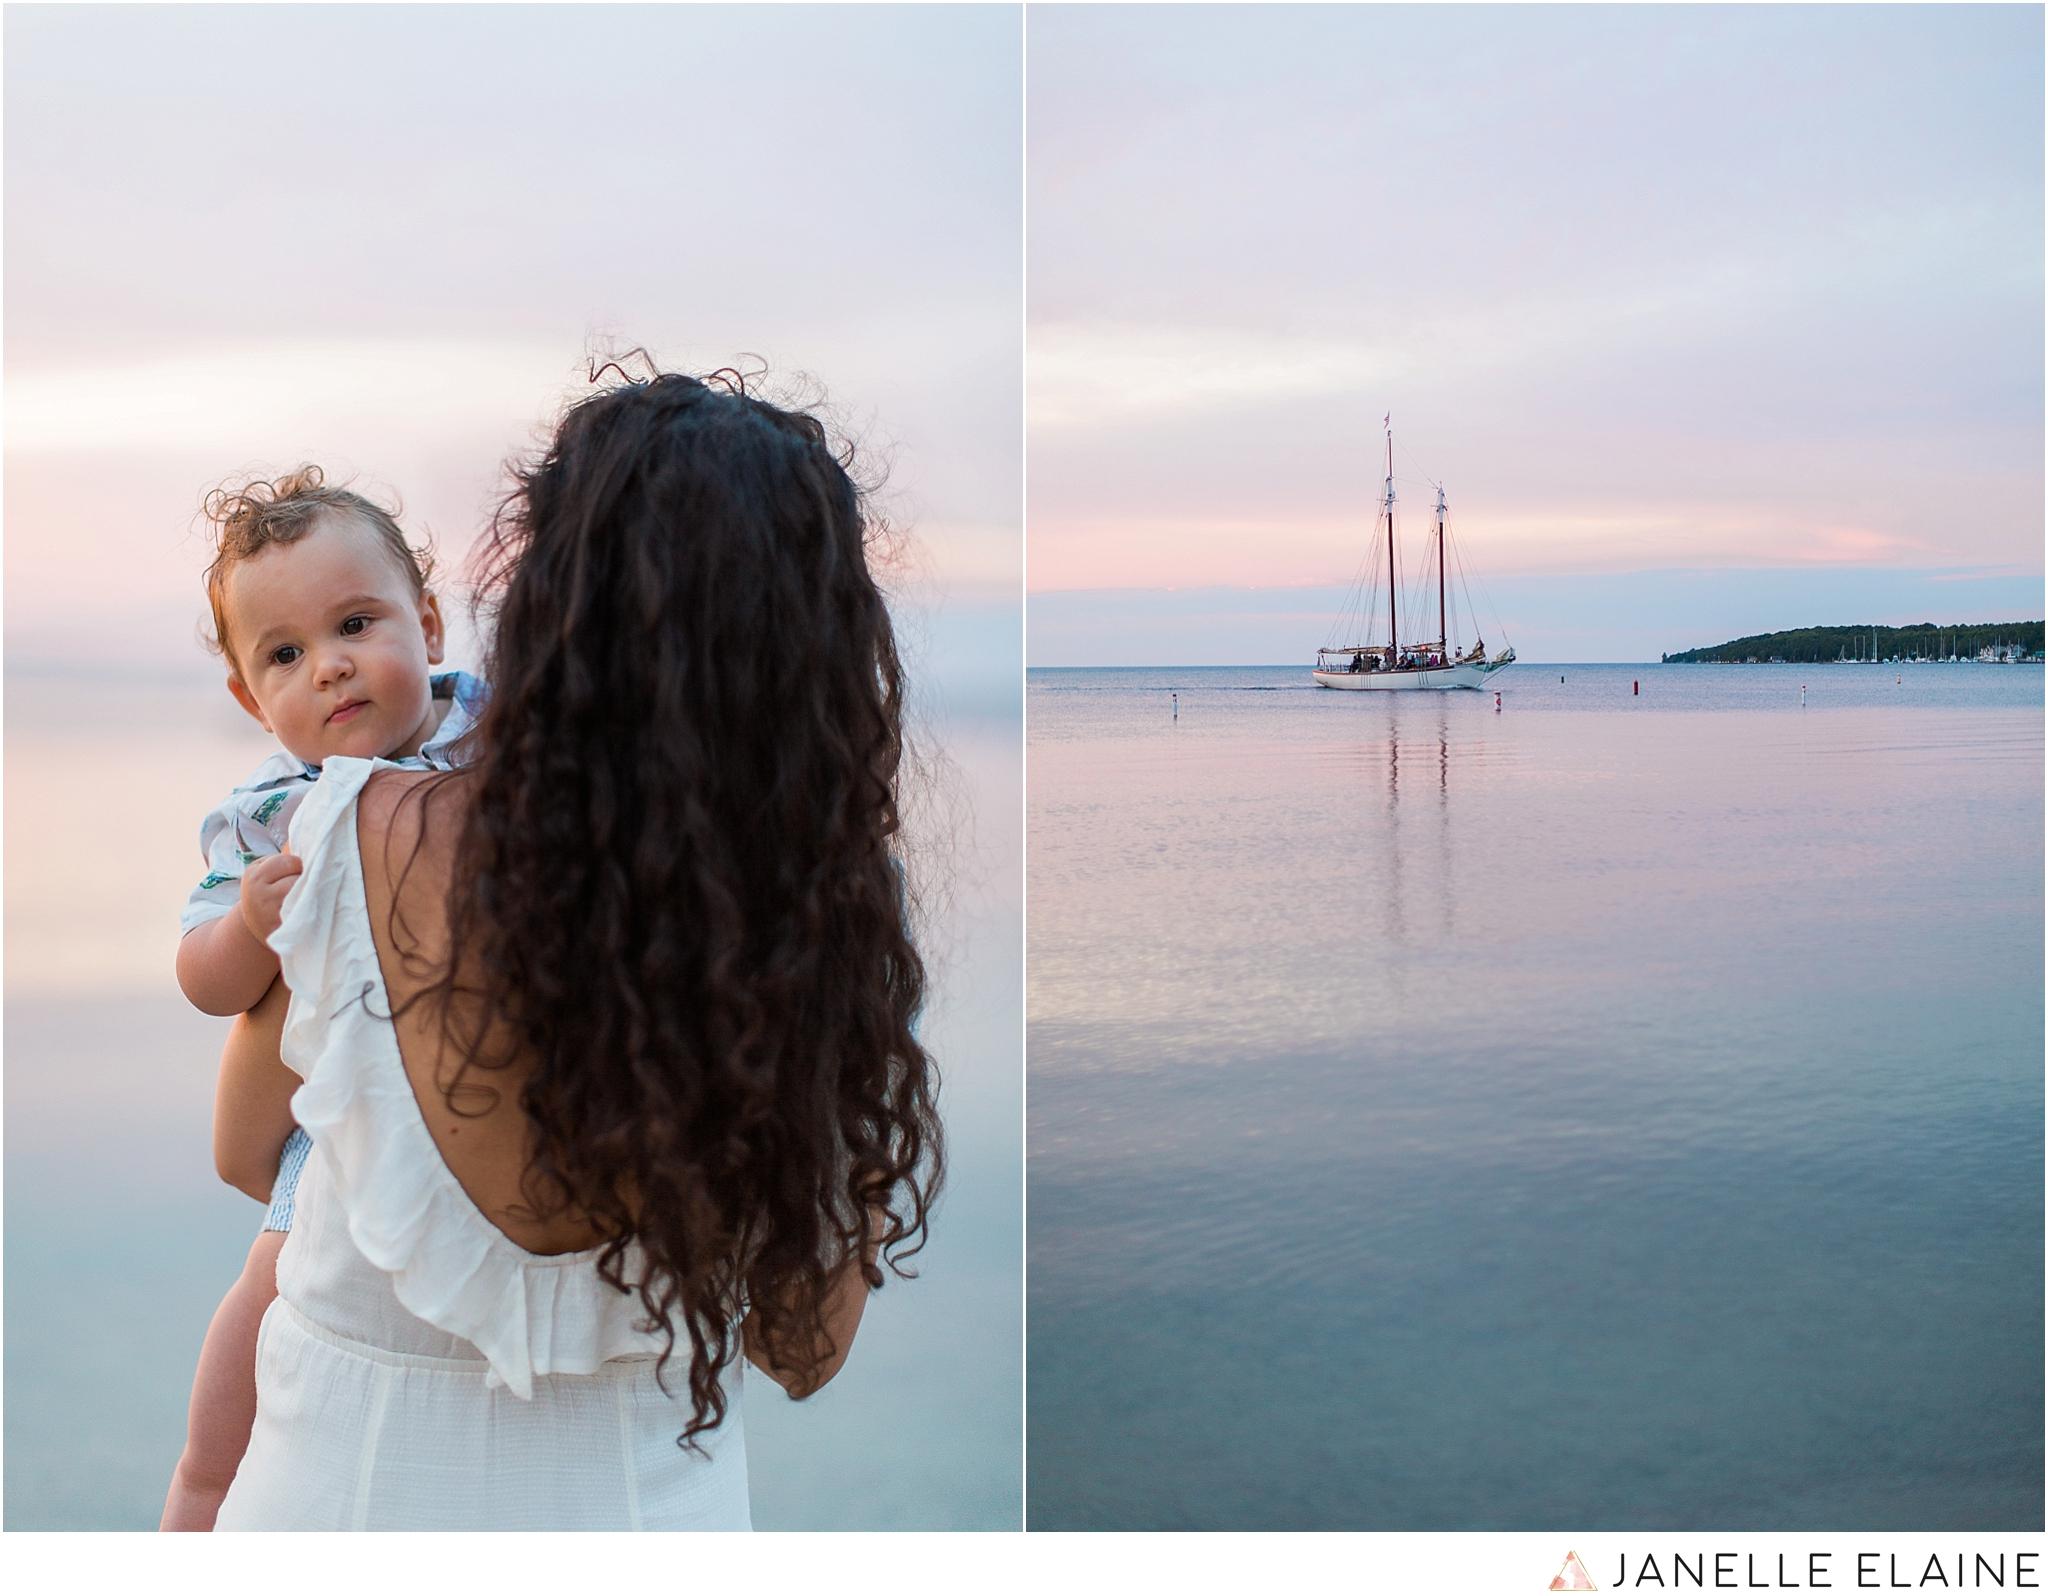 naylor-madigan-portraits-janelle elaine photography-destination photographer-34.jpg